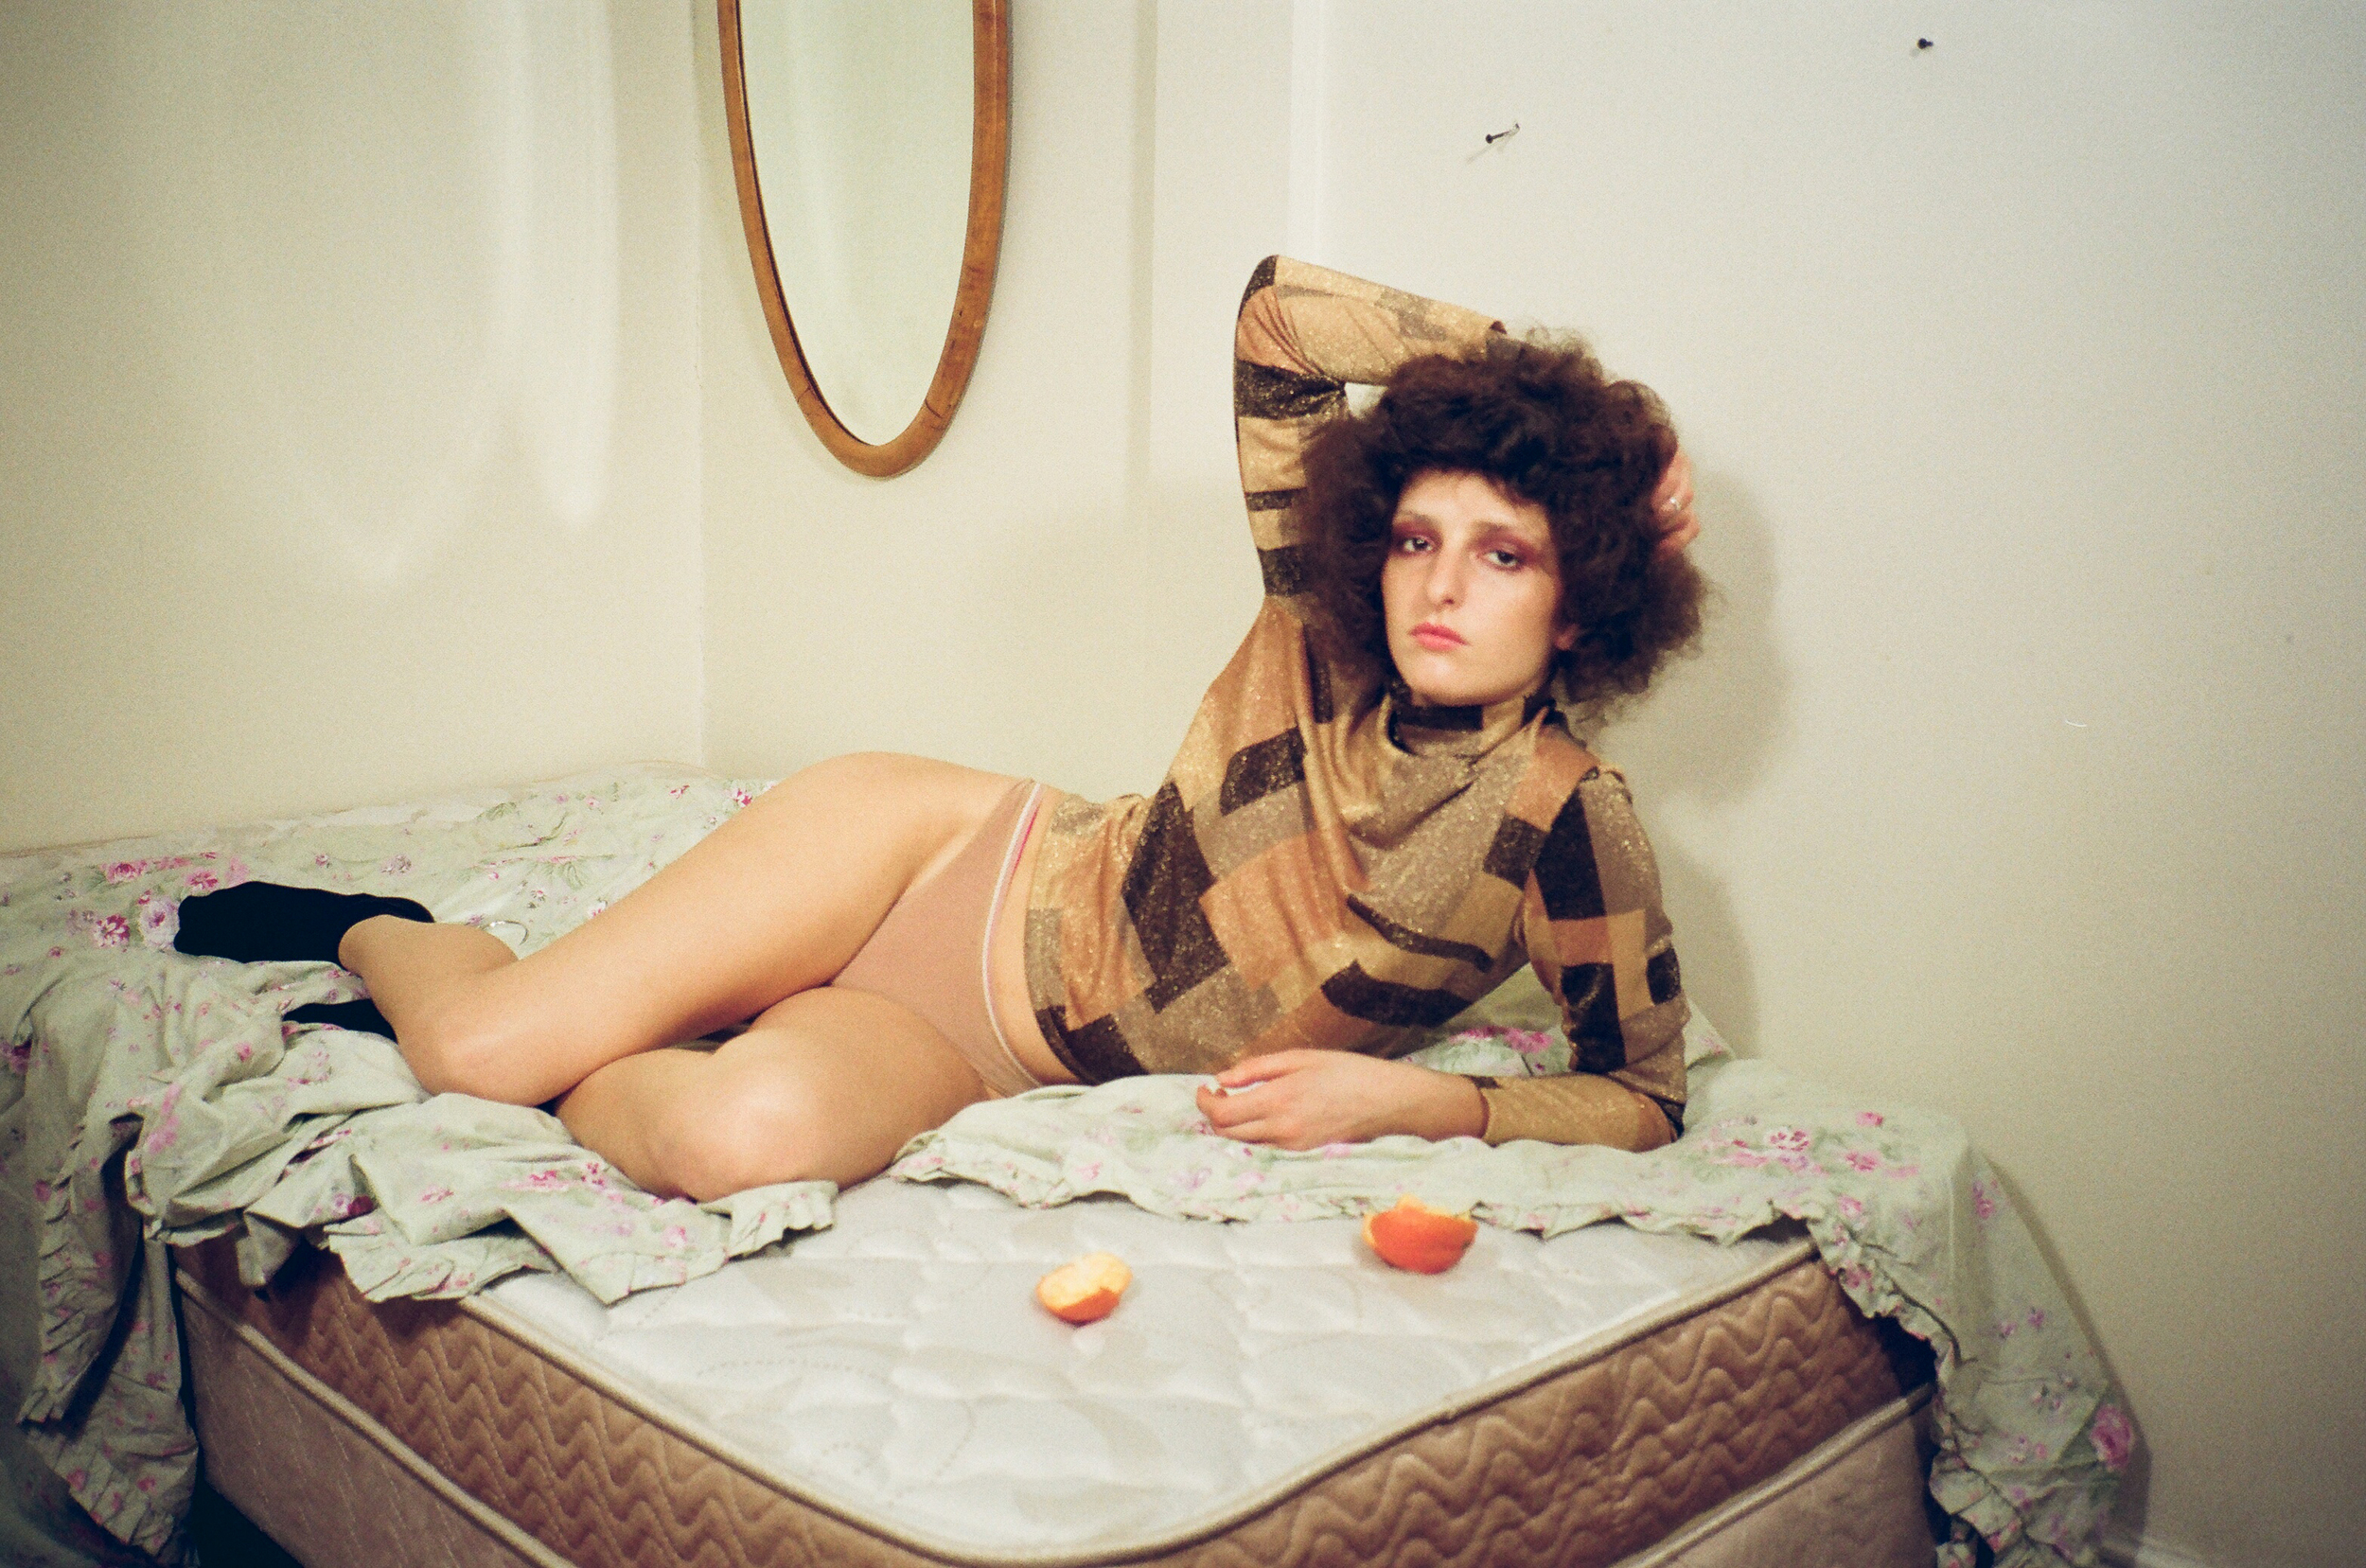 Vintage Turtleneck from Amacord Vintage  Underwear by Calvin Klein  Tabi Socks Stylist's Own